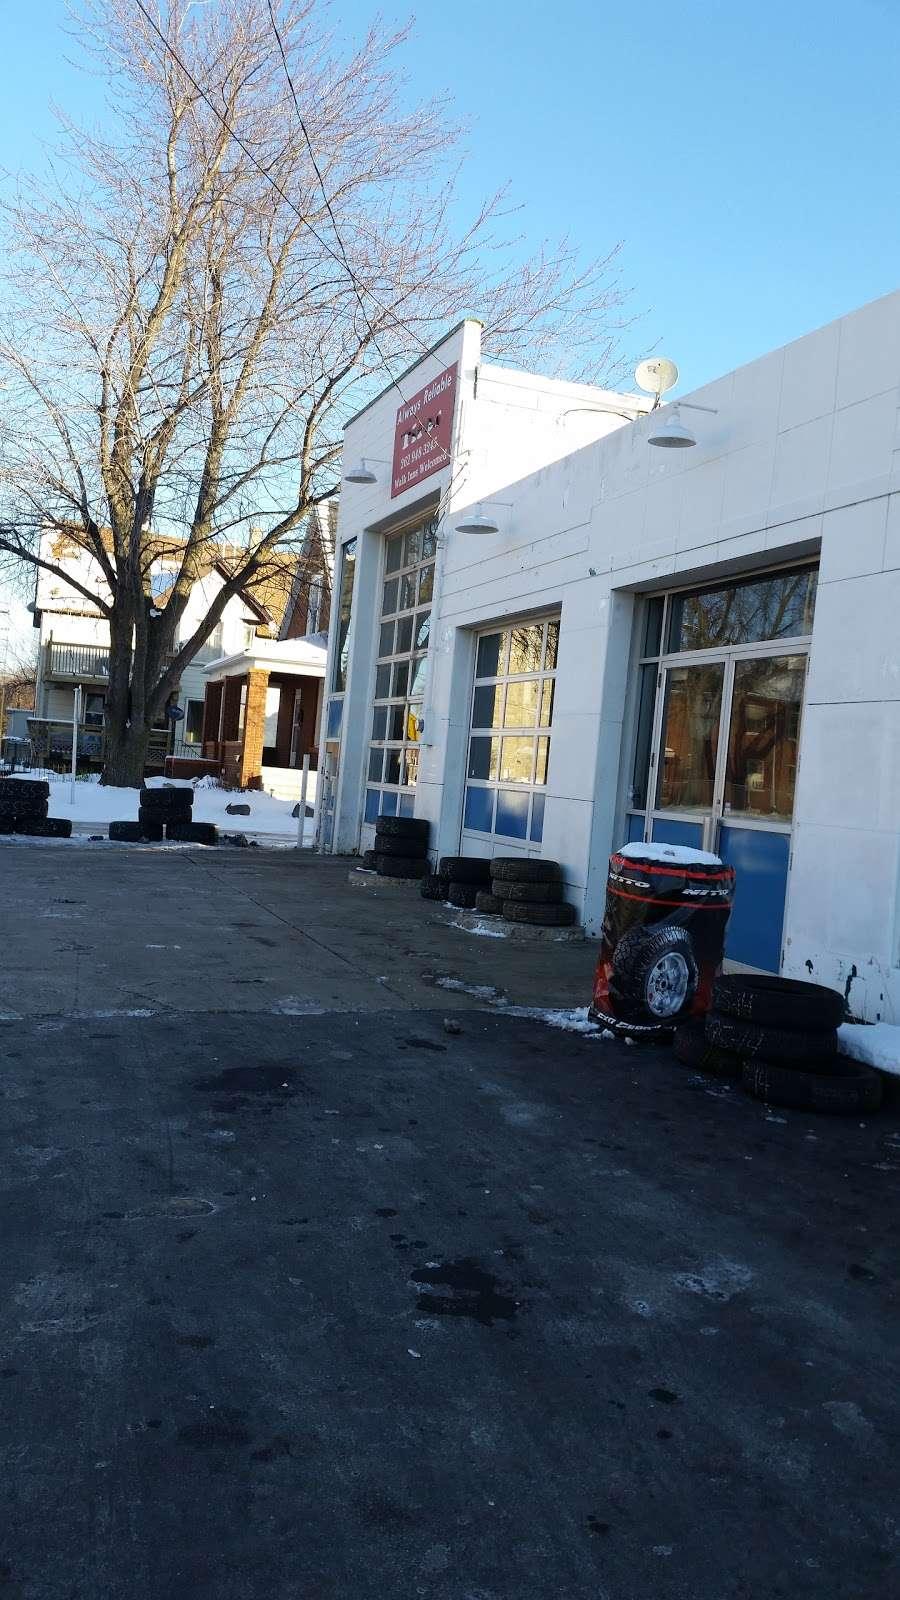 Always Reliable Tires - car repair  | Photo 7 of 8 | Address: 2120 52nd St, Kenosha, WI 53140, USA | Phone: (262) 948-3245